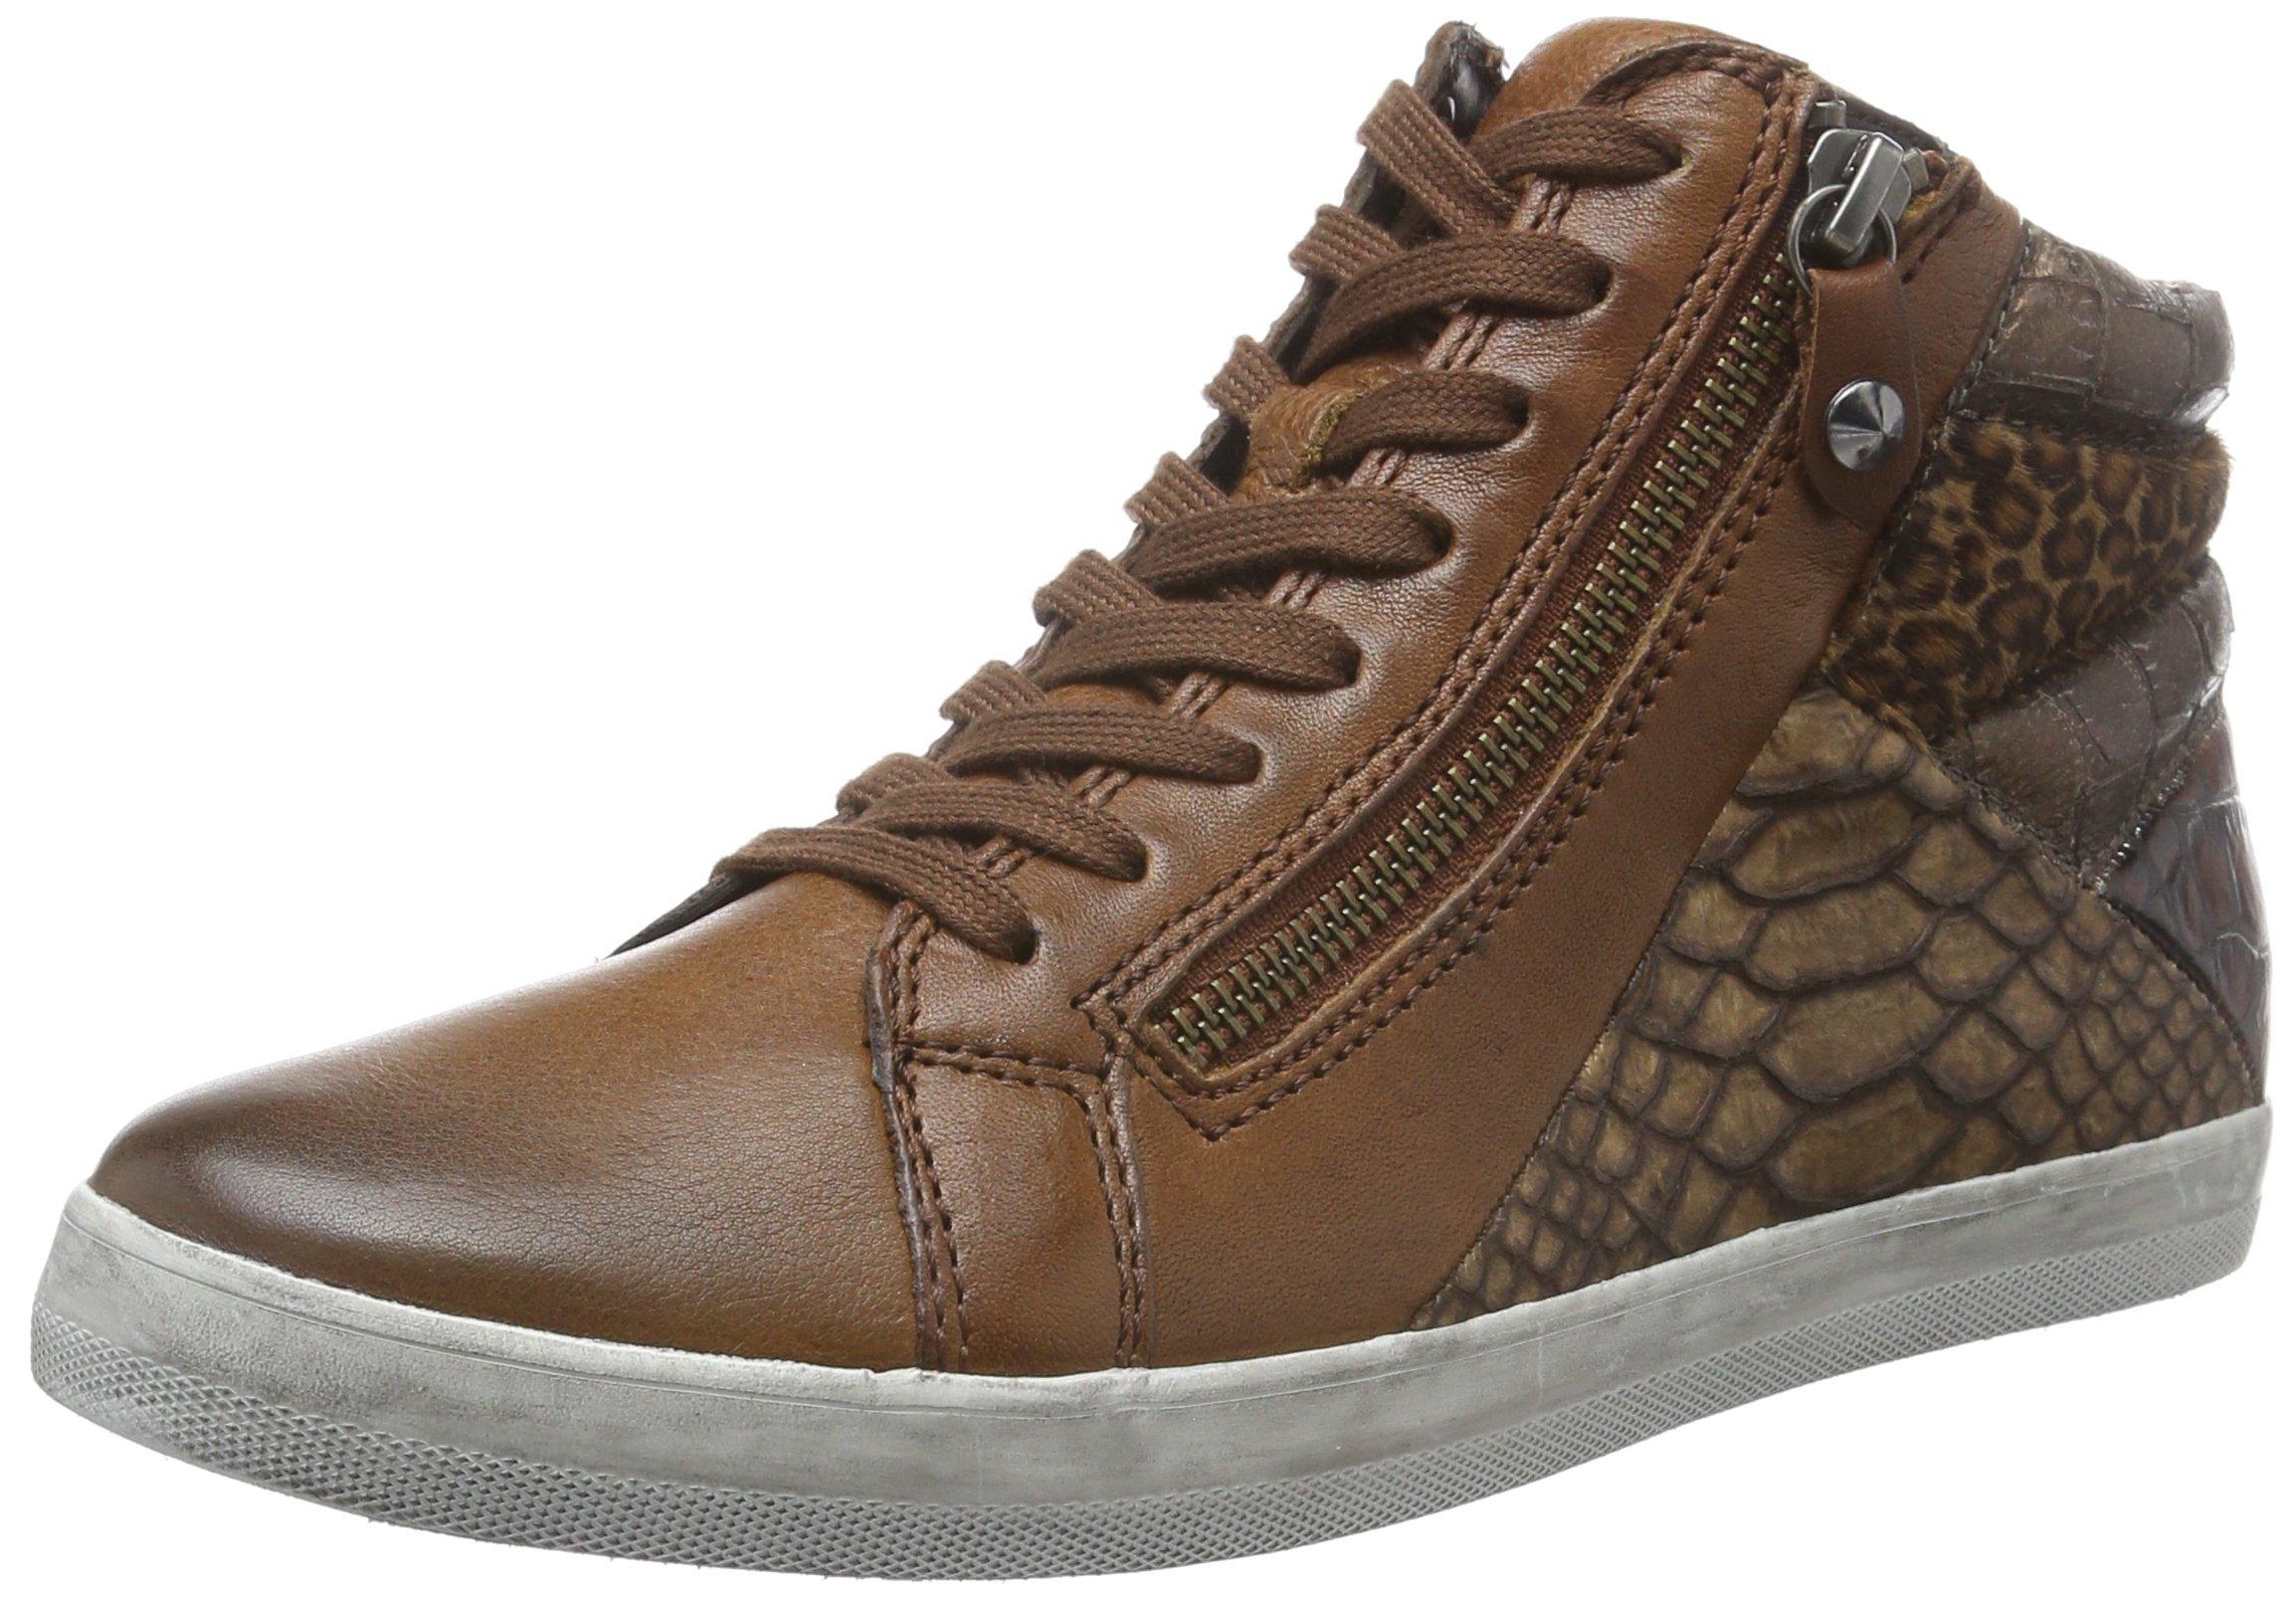 Gabor Eu 5 FemmeMarron40 426 Sneakers Shoes 56 Hautes odCxBe